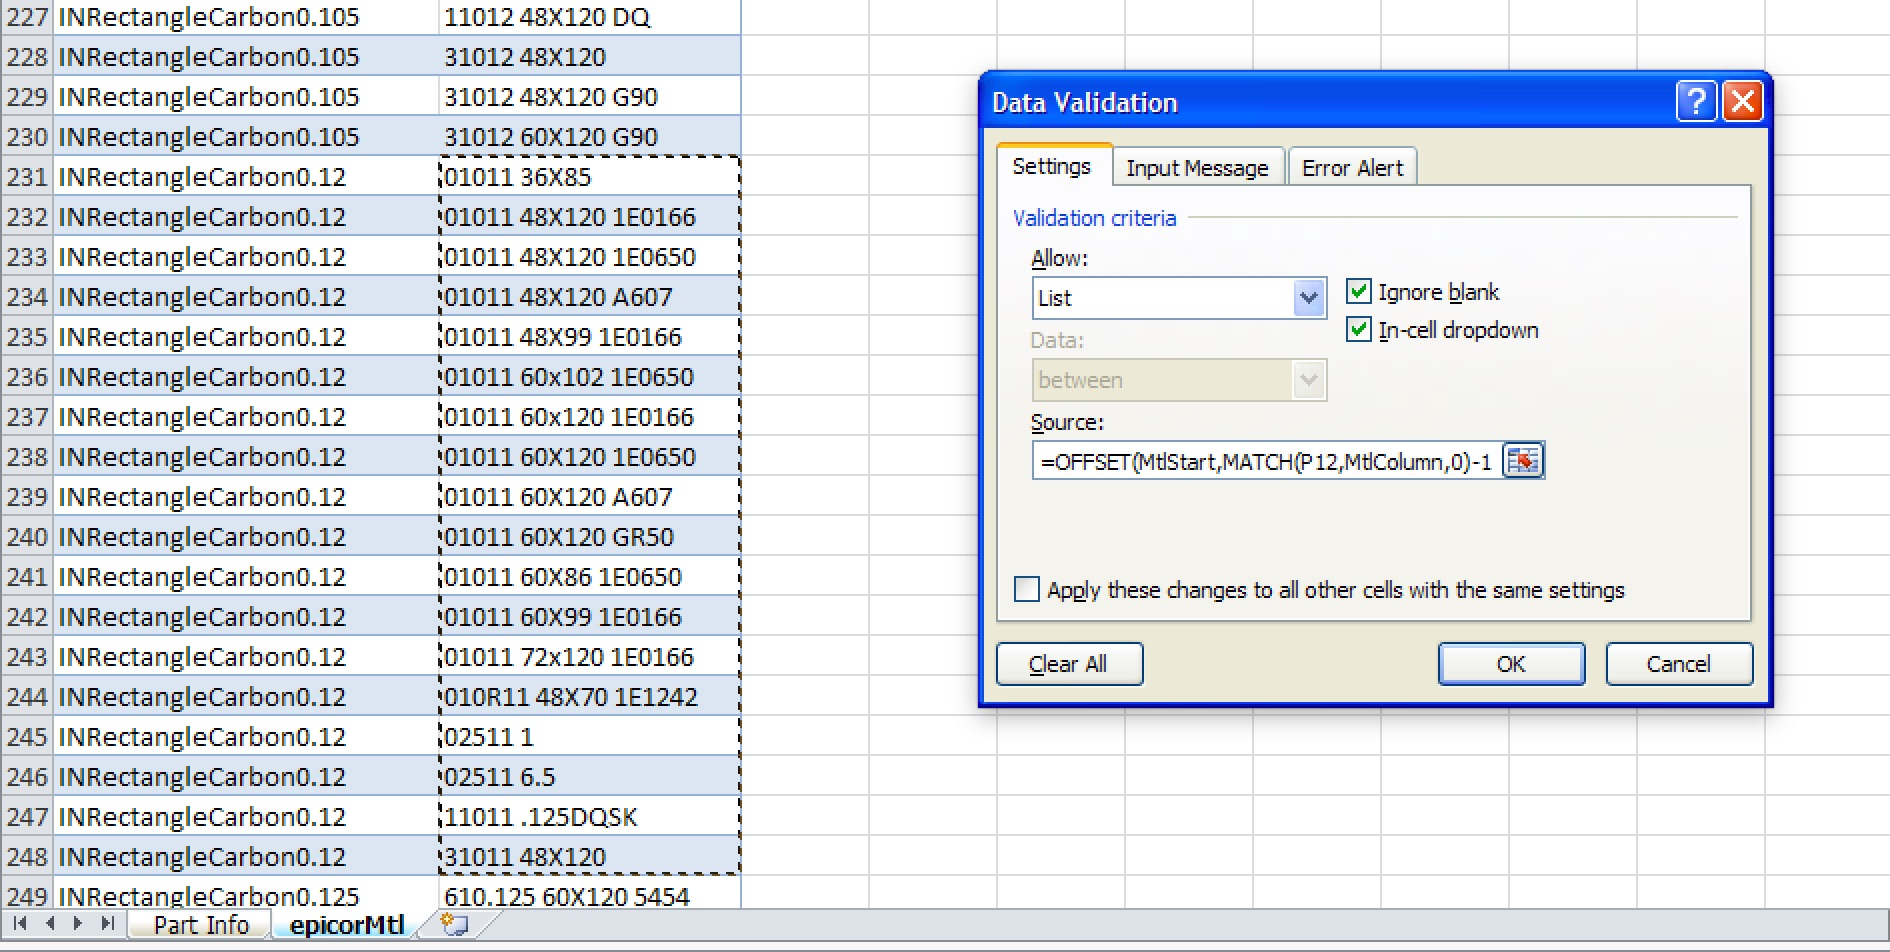 Excel Vba Font Size Of Data Validation List